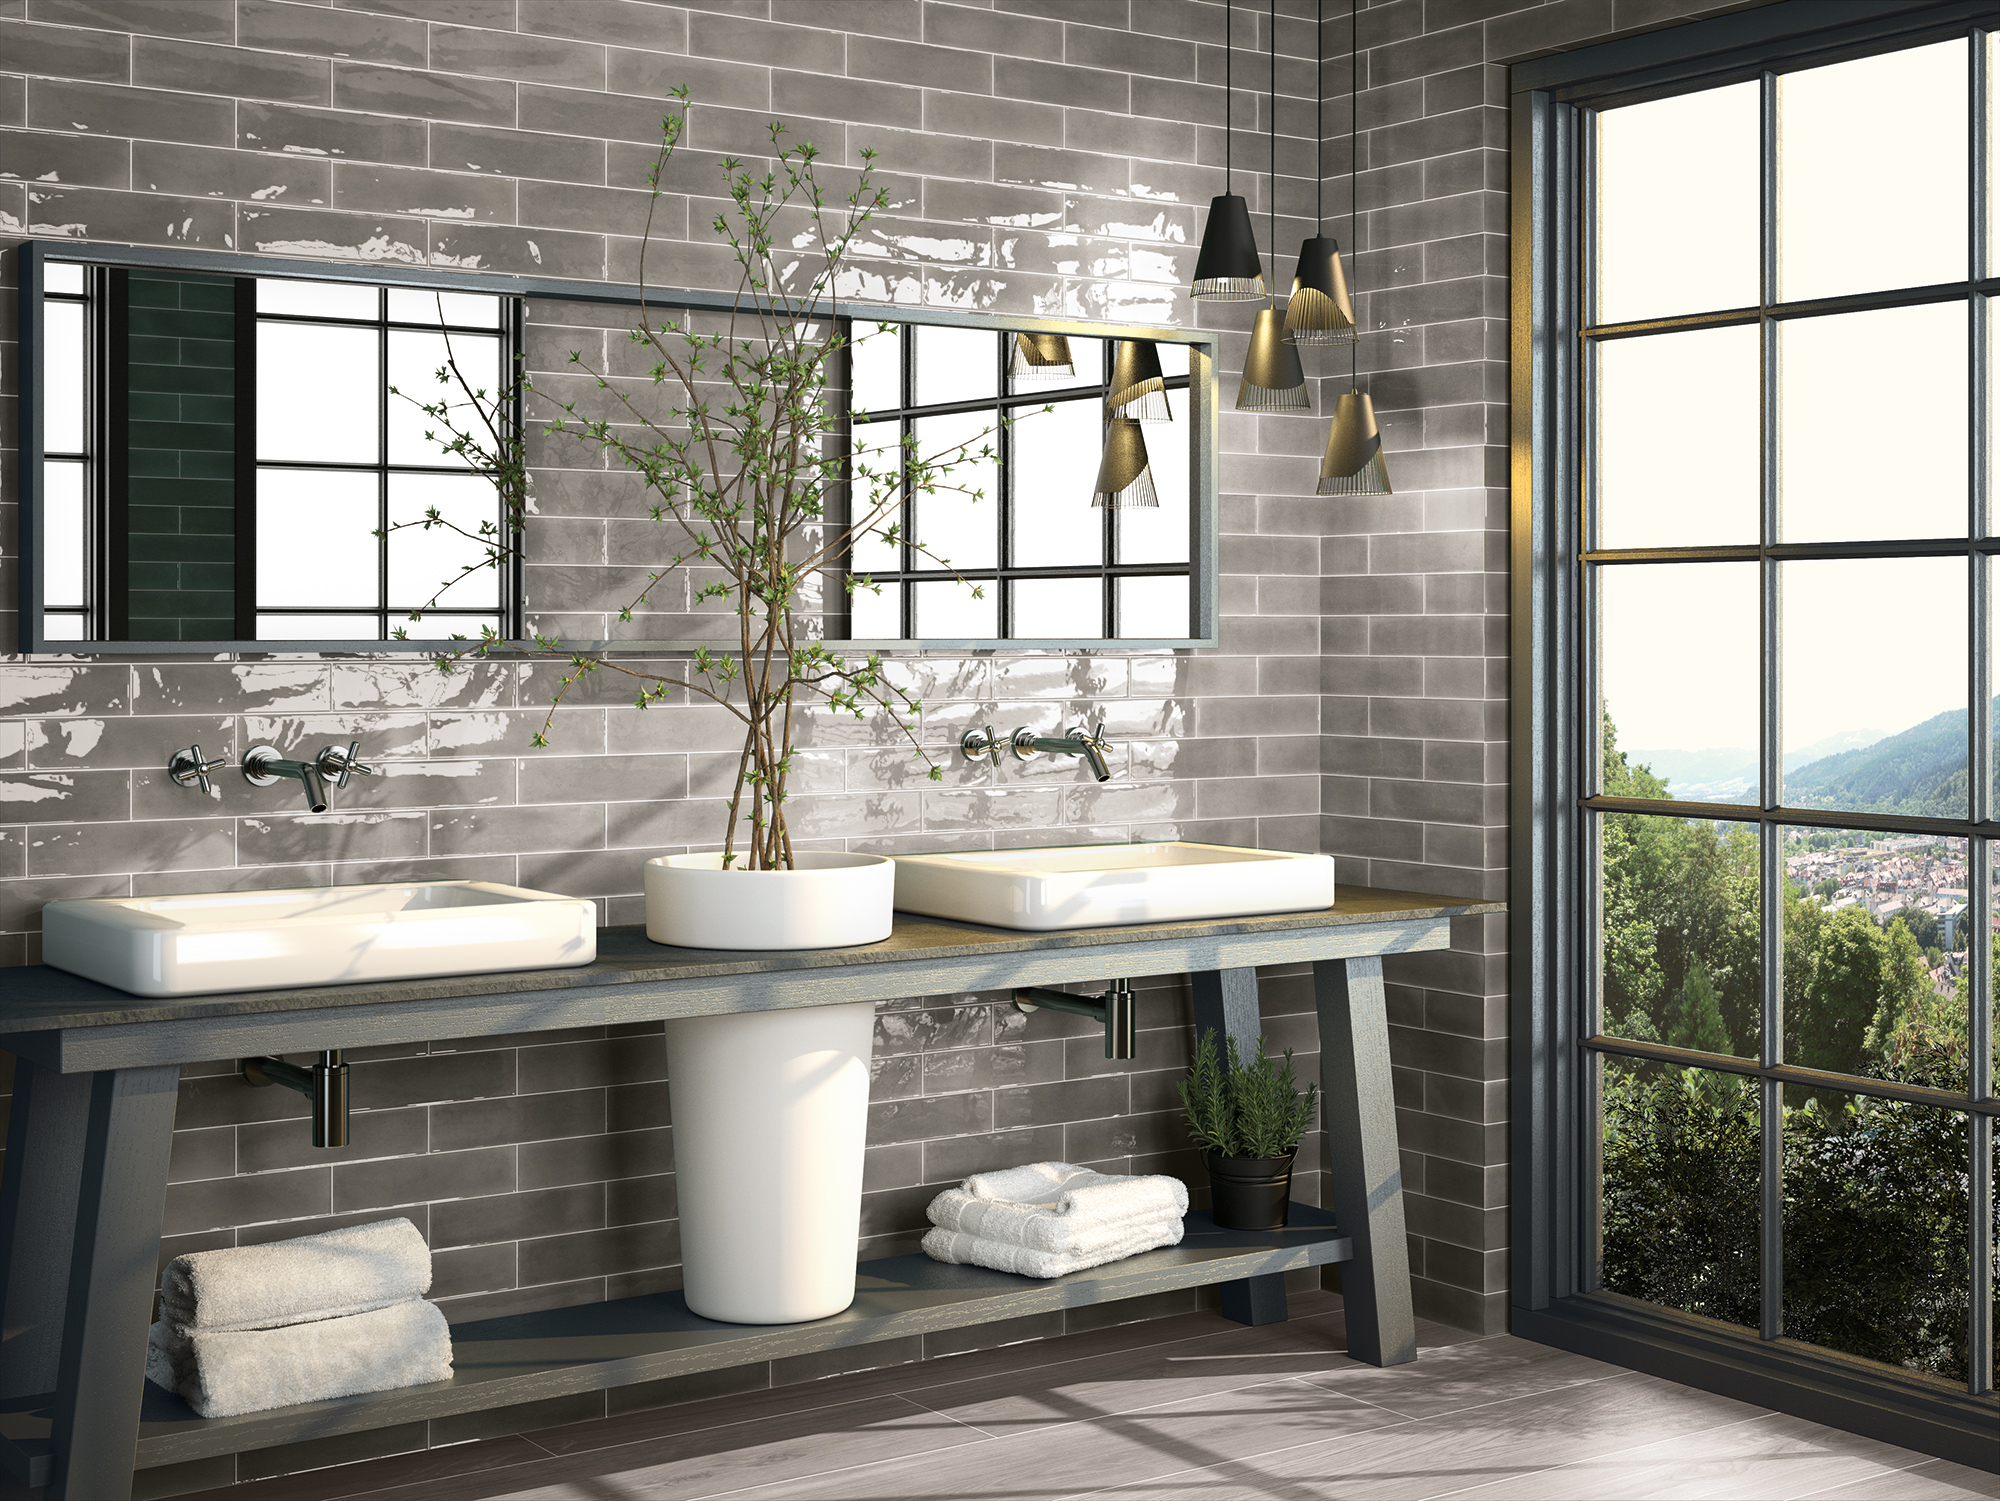 wandfliesen glow grau gl nzend 7 5x30cm dekorfliesen retro look ebay. Black Bedroom Furniture Sets. Home Design Ideas